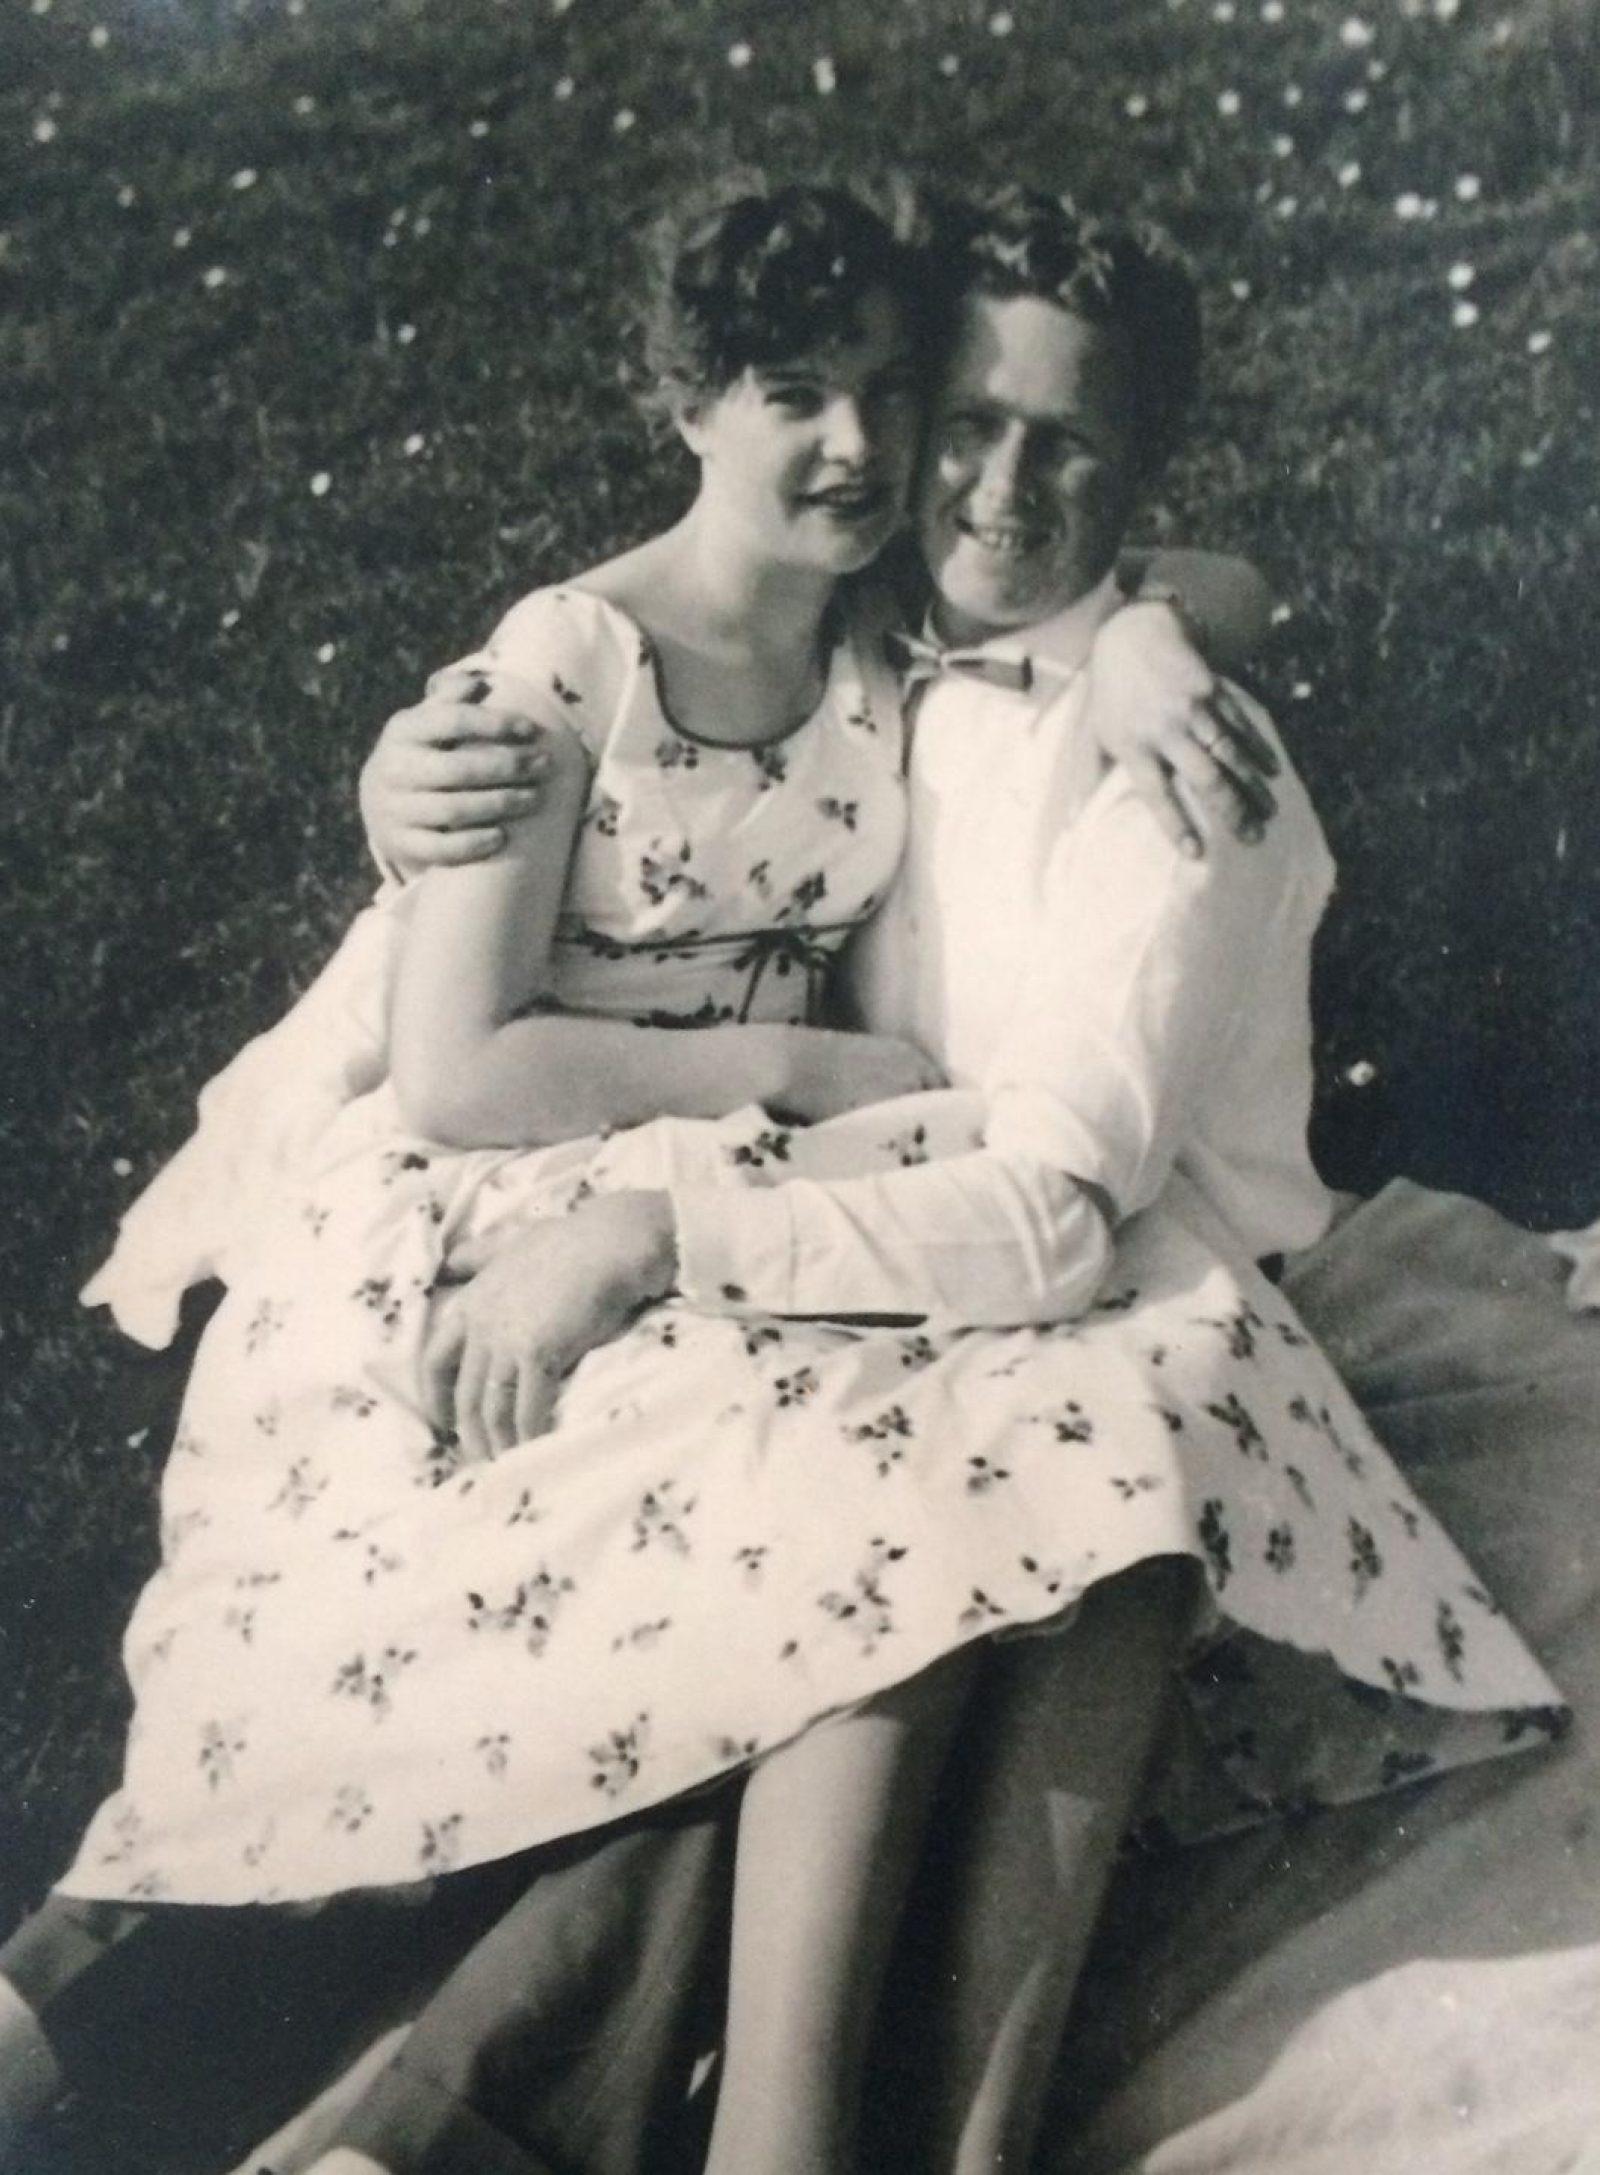 Jan en Geke de Groot verliefd